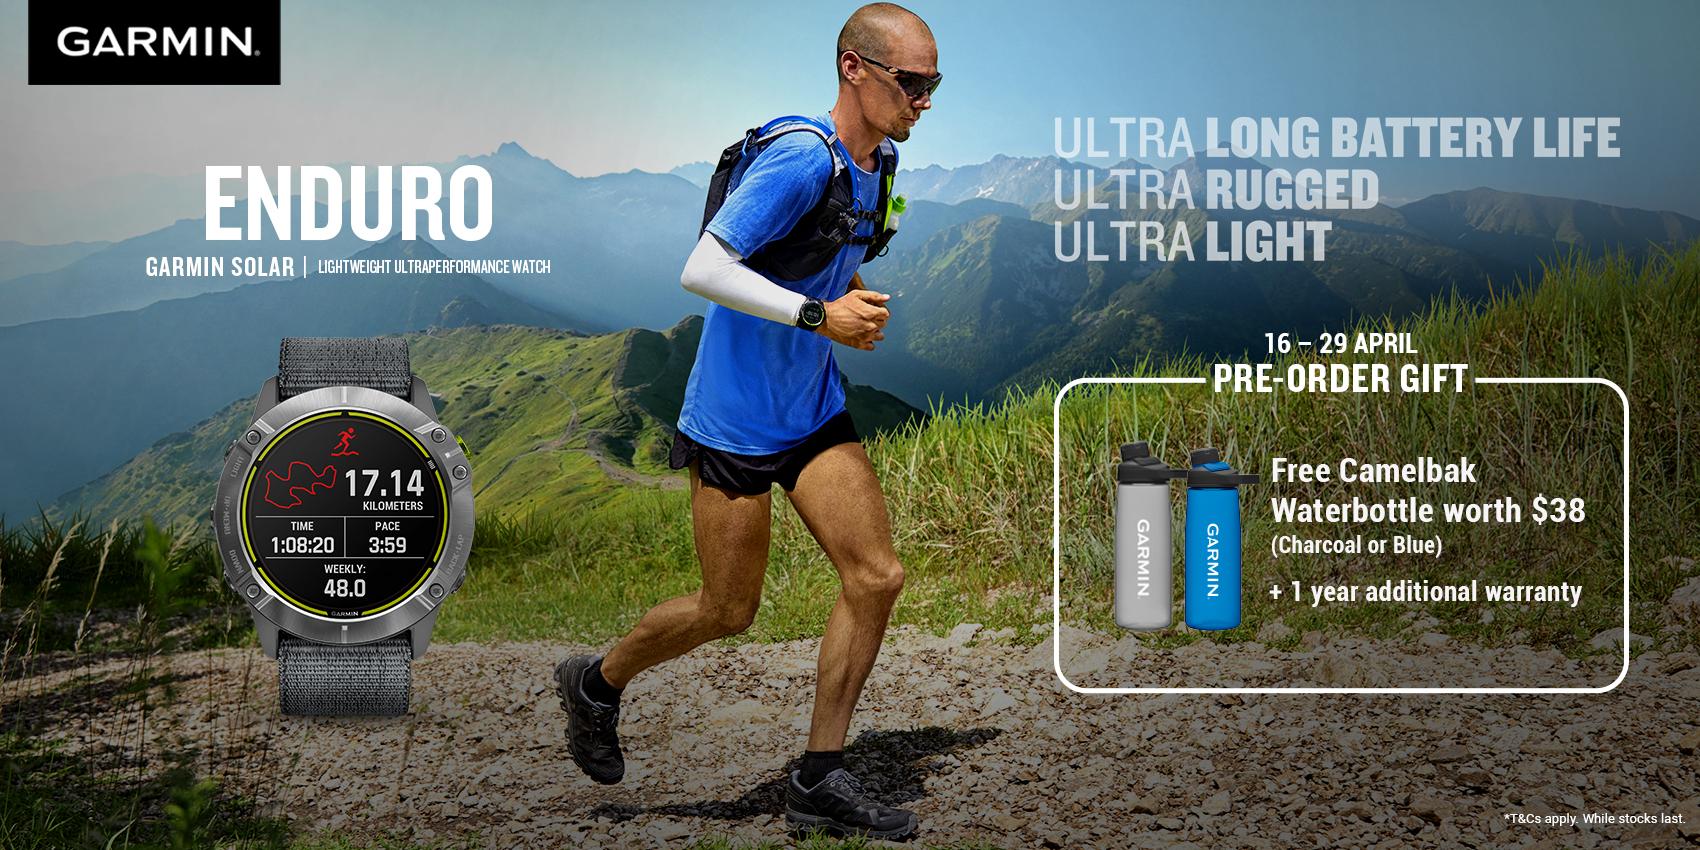 Garmin Enduro GPS Smartwatch Pre-Order